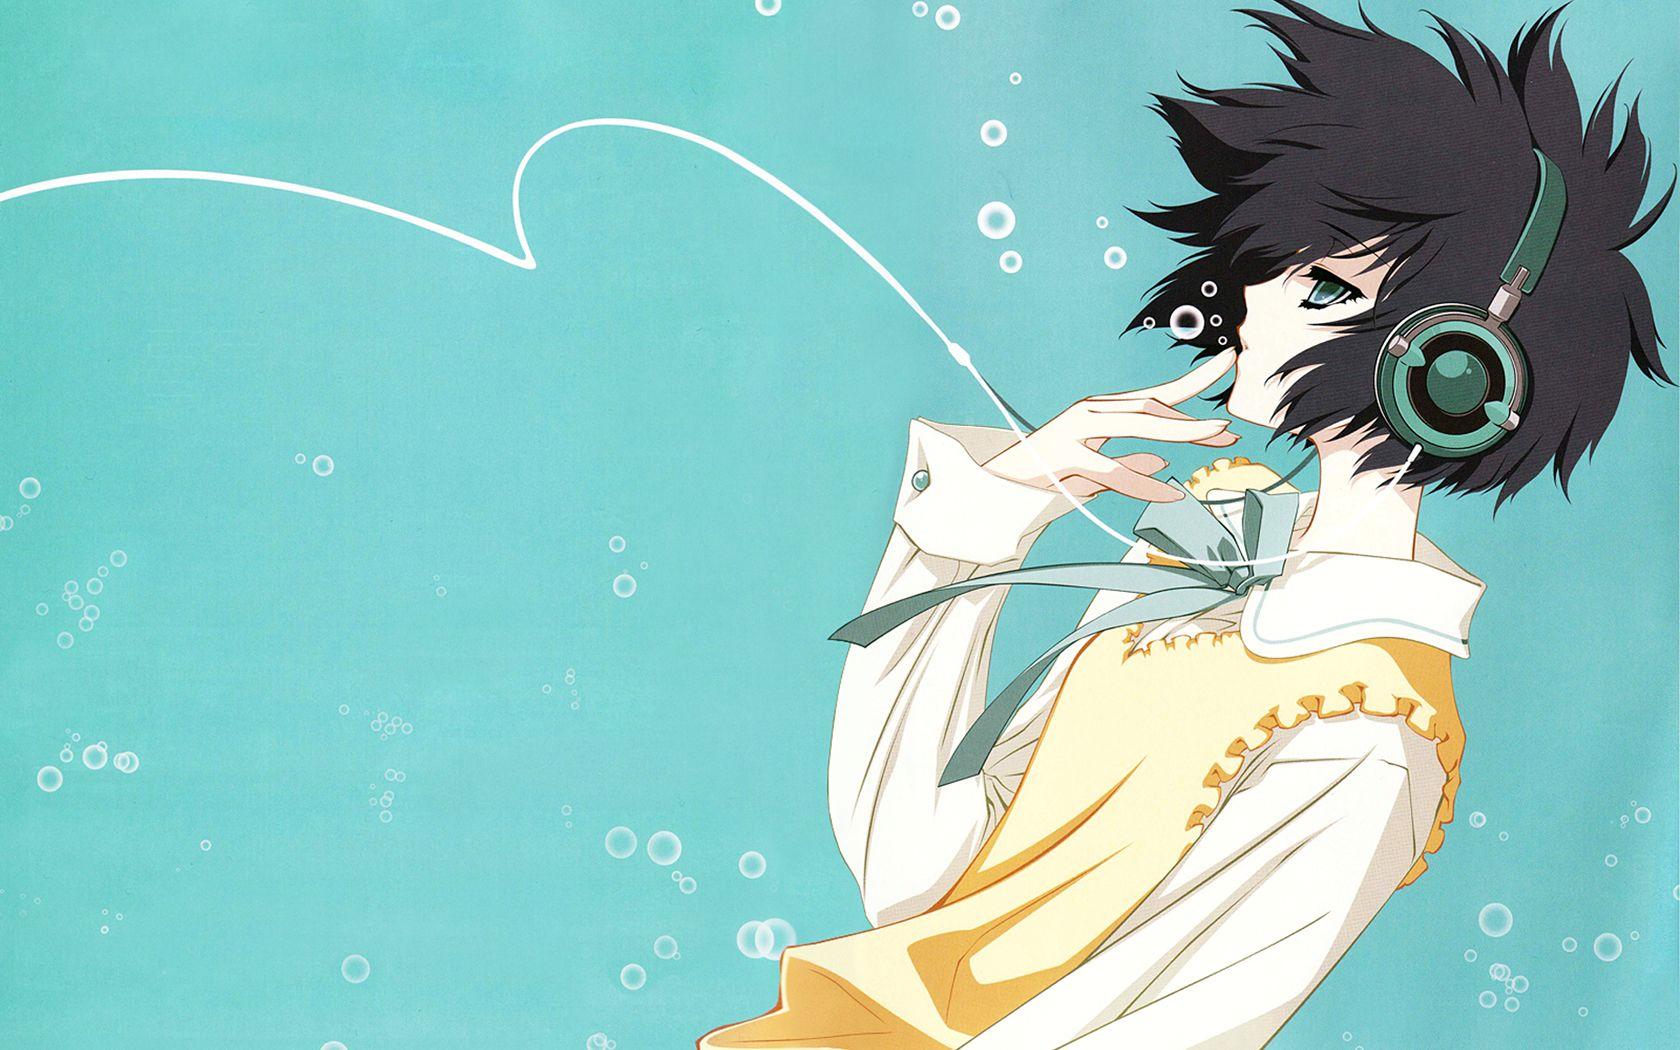 Pin On Anime Anime boy headphones wallpaper